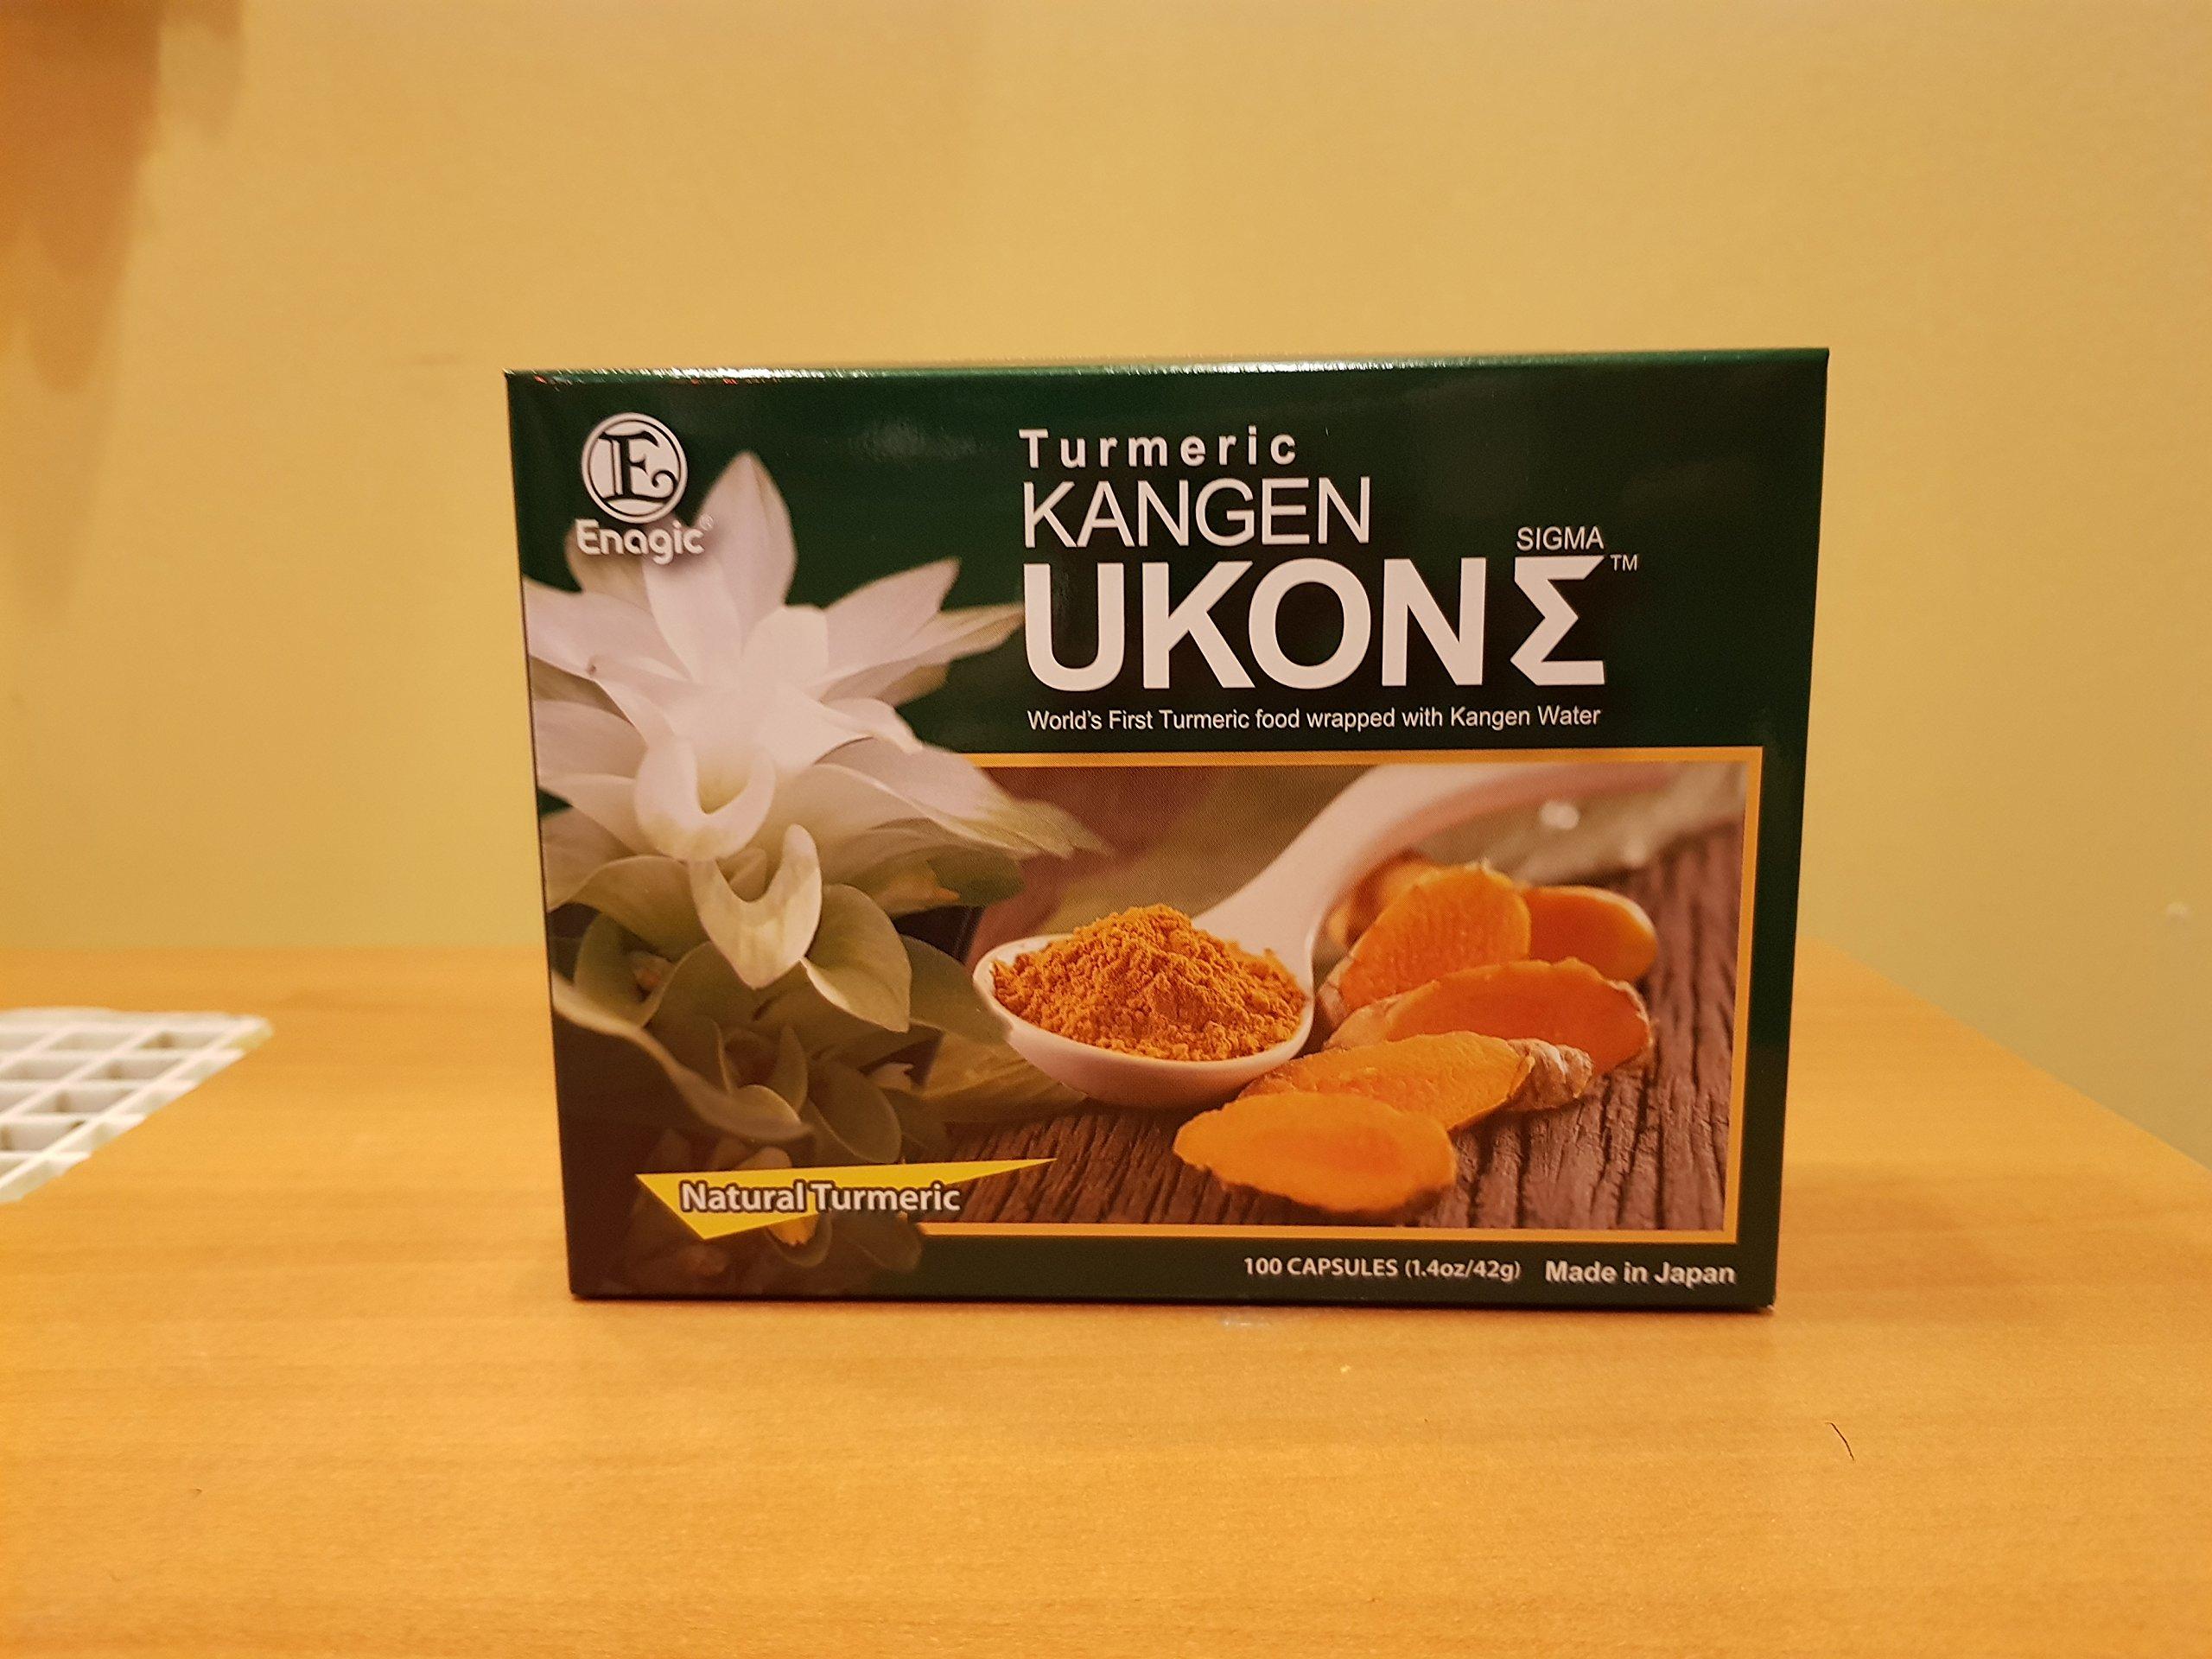 ORGANIC KANGEN UKON SIGMA TURMERIC (SUPER ANTI-OXIDIXING DIETARY SUPPLEMENT) 100 Capsules